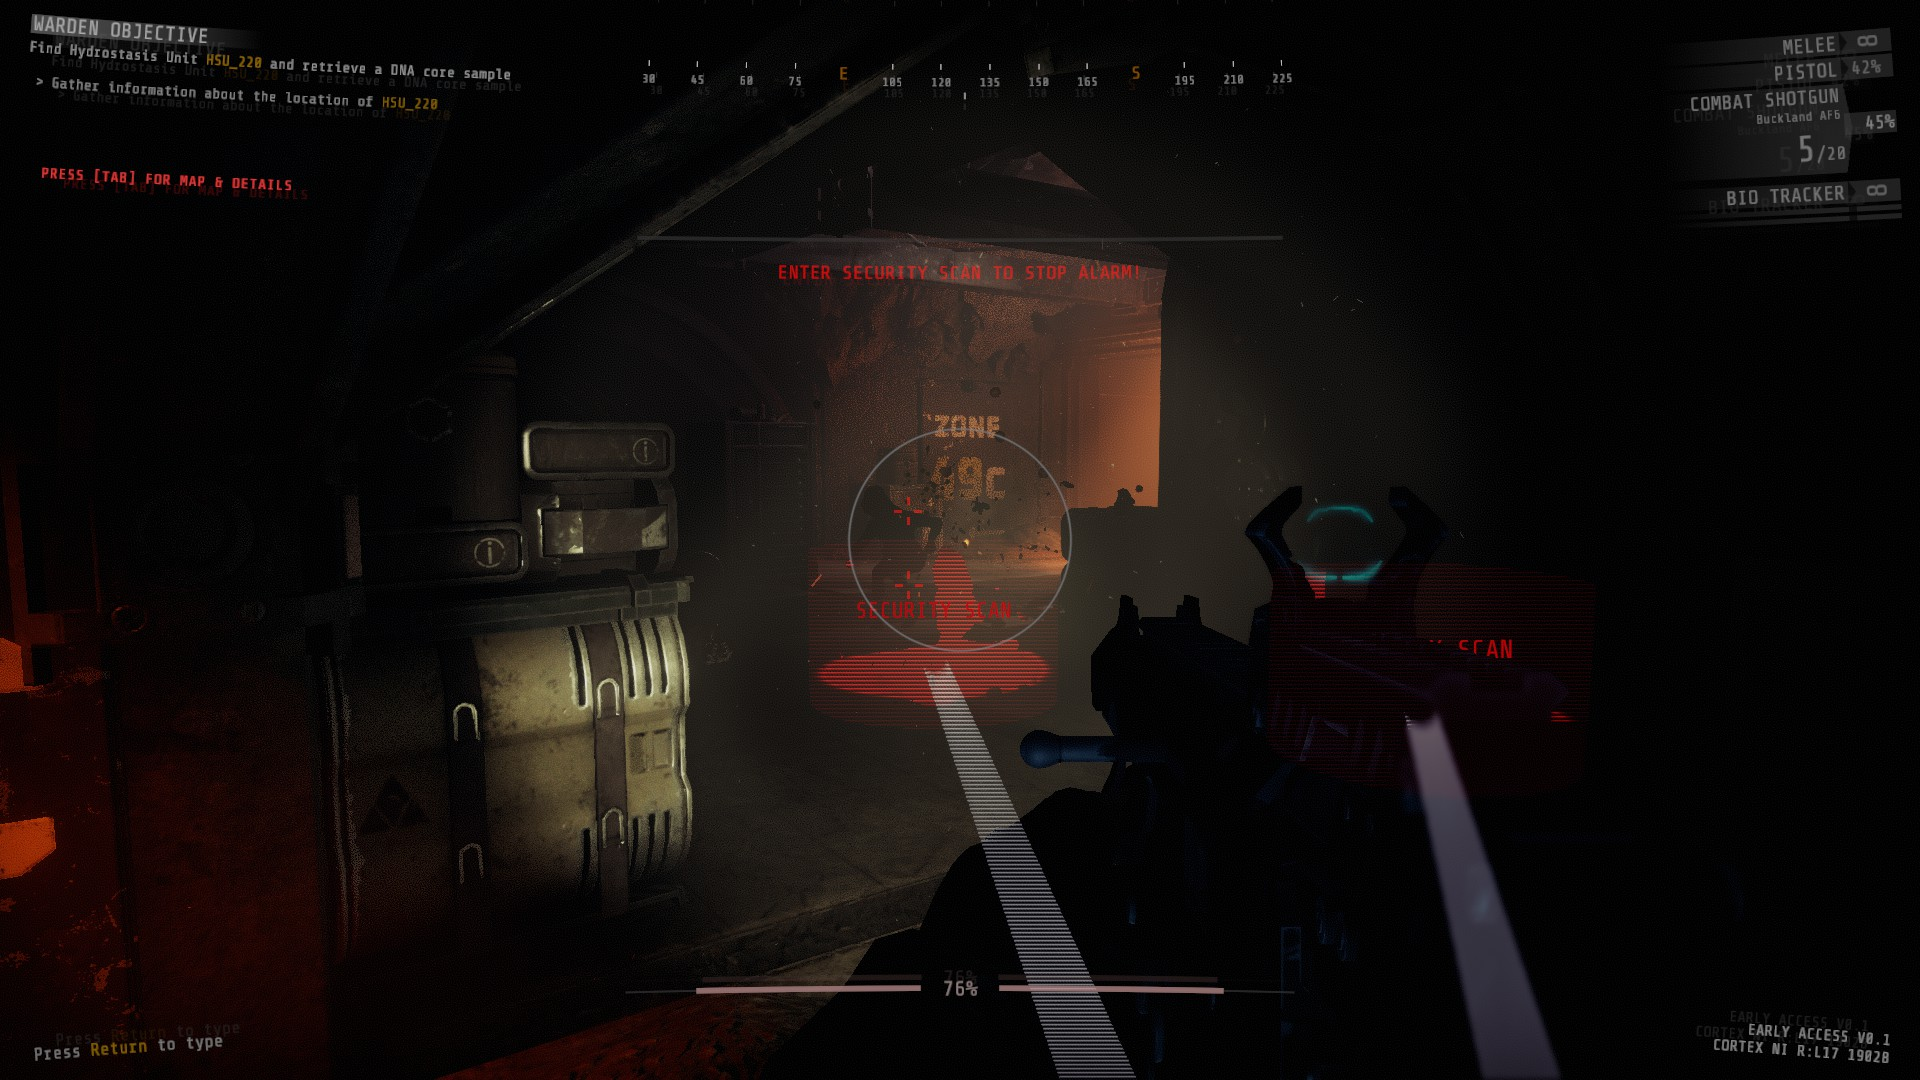 [PCゲーム]GTFO早期アクセス、そうだ皆で地下施設を調べにいこう。8